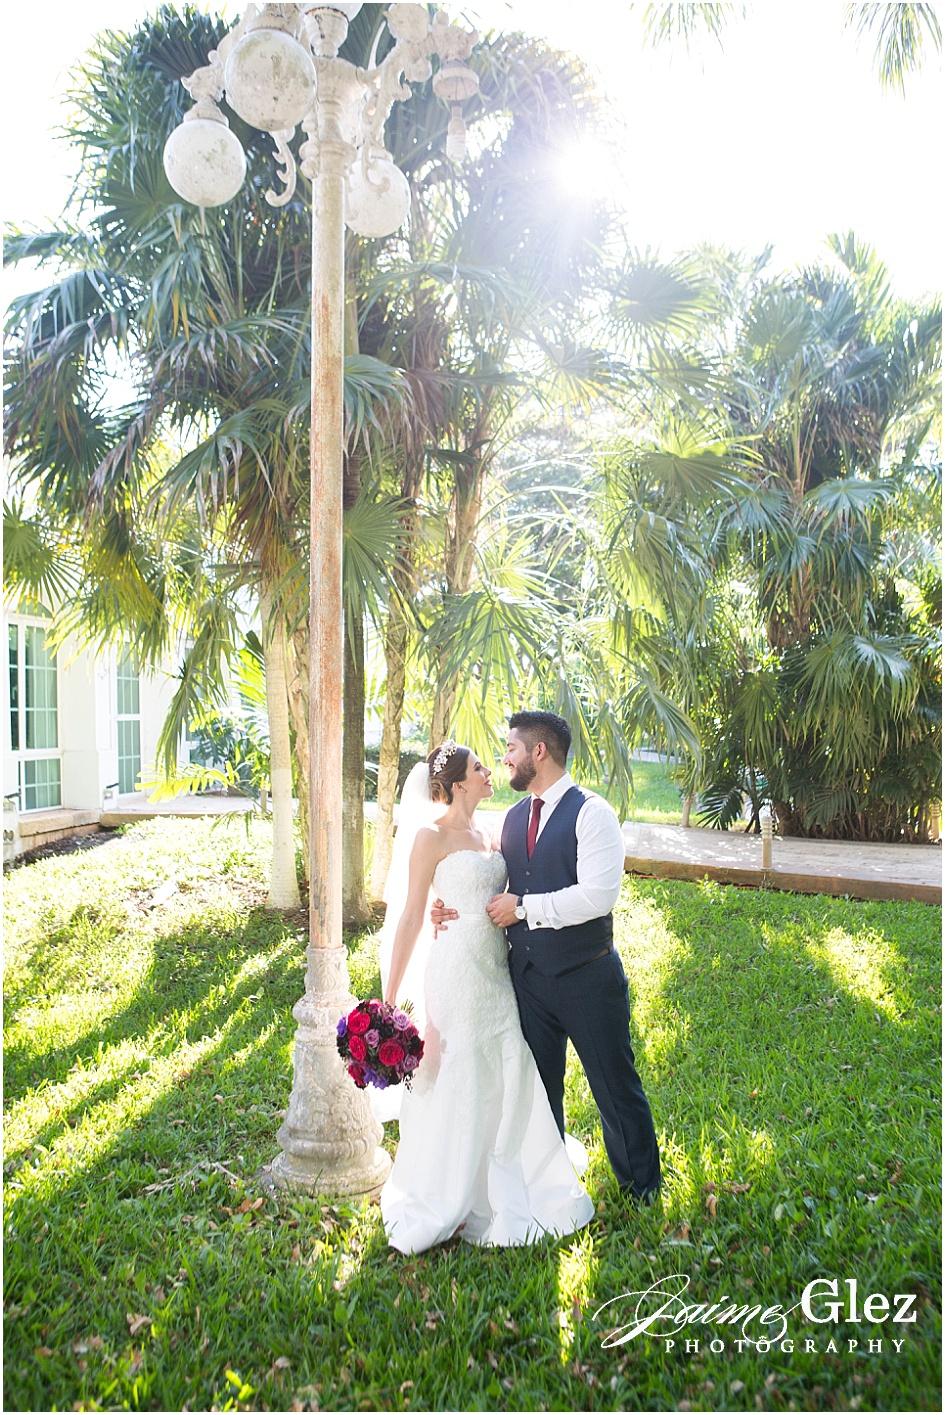 fotografos de bodas en merida yucatan 6